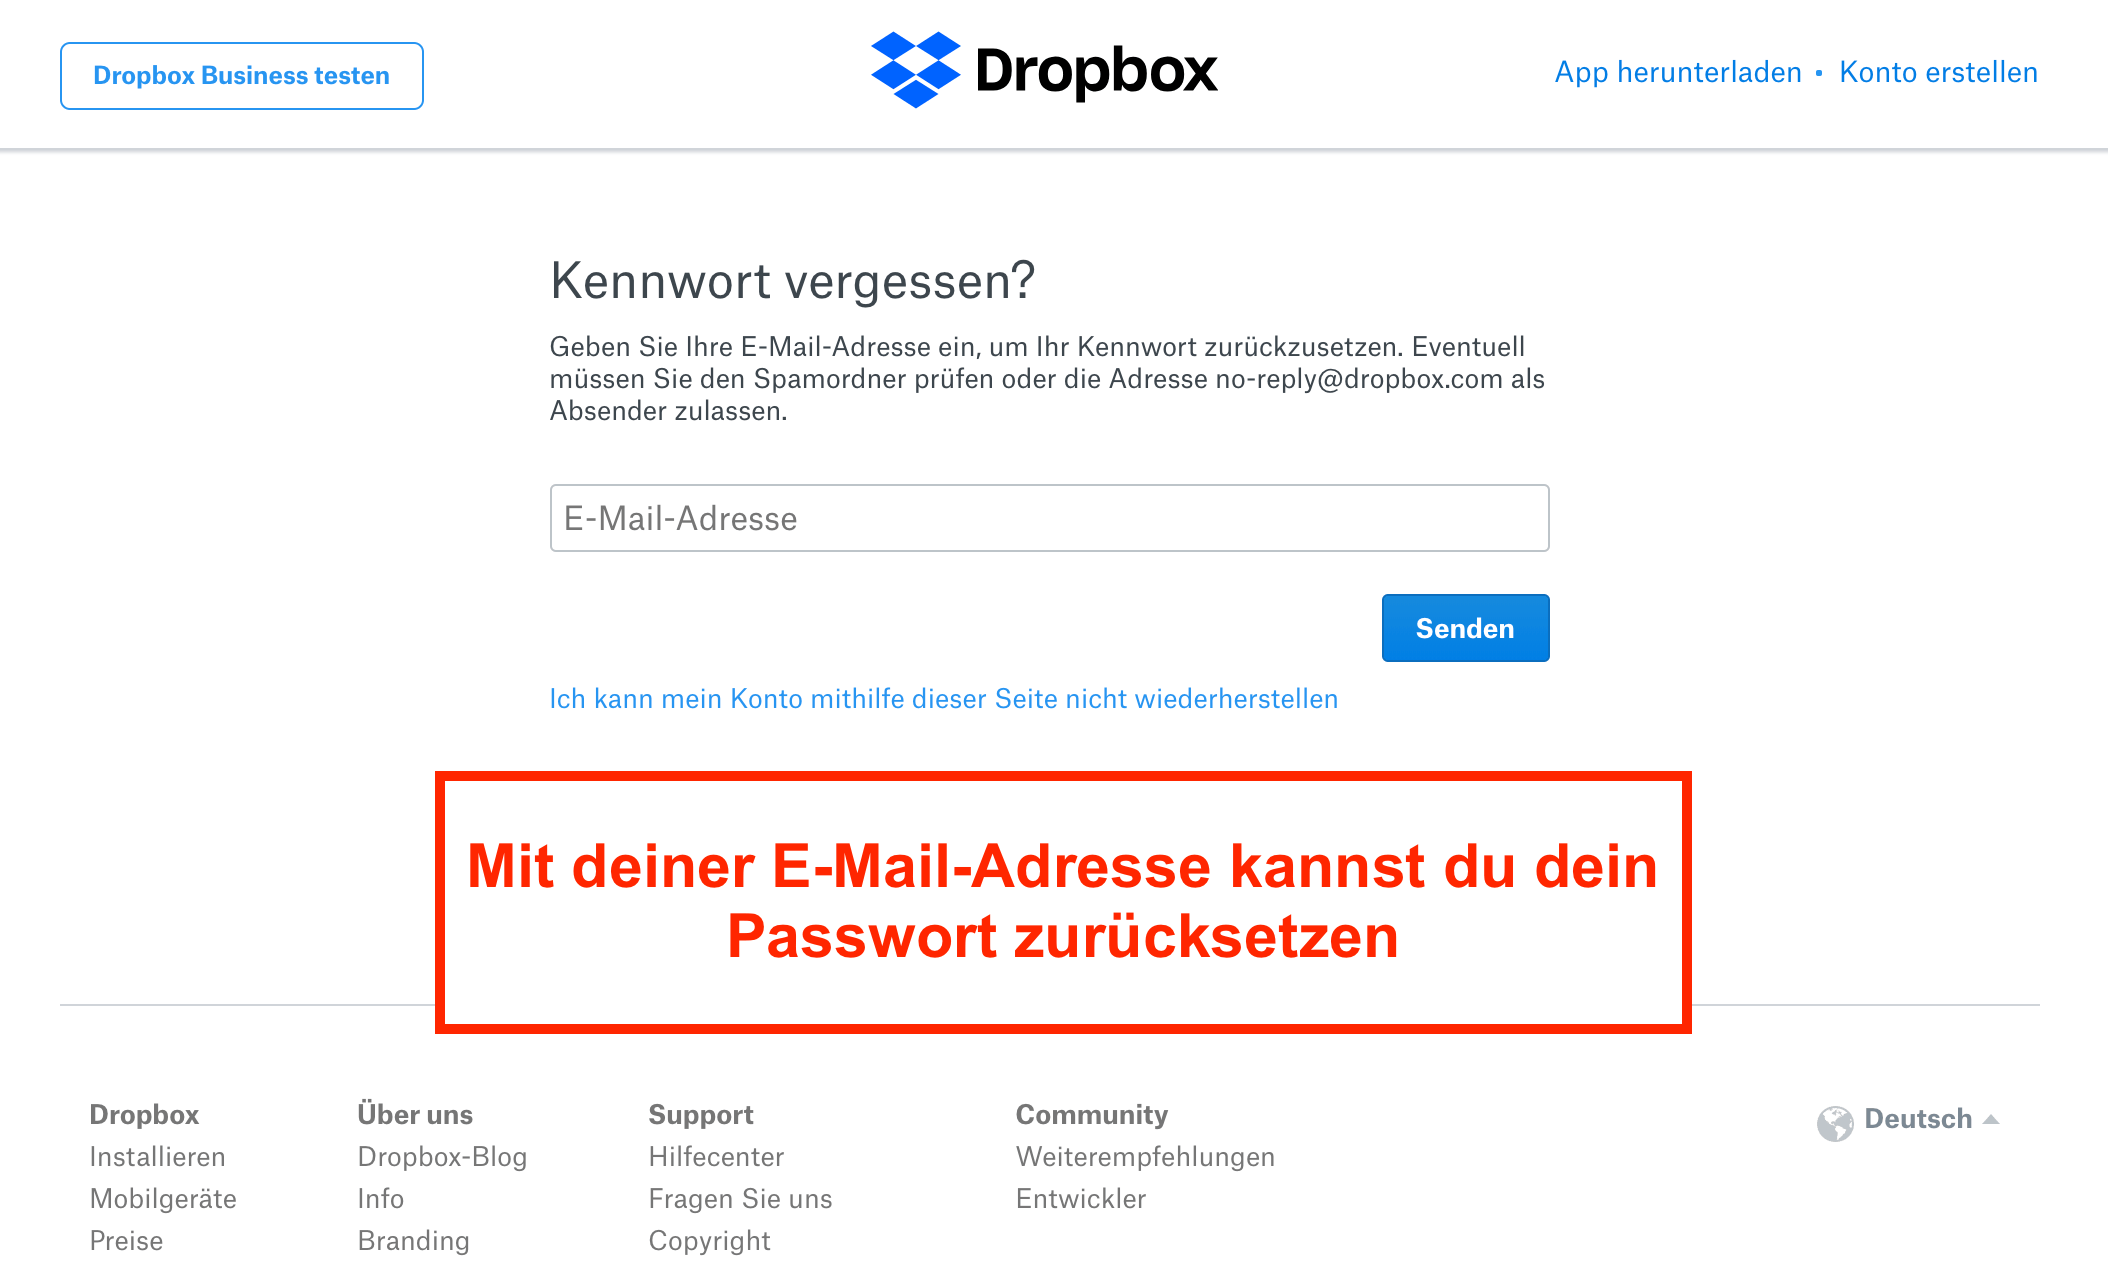 Dropbox Passwort zurücksetzen